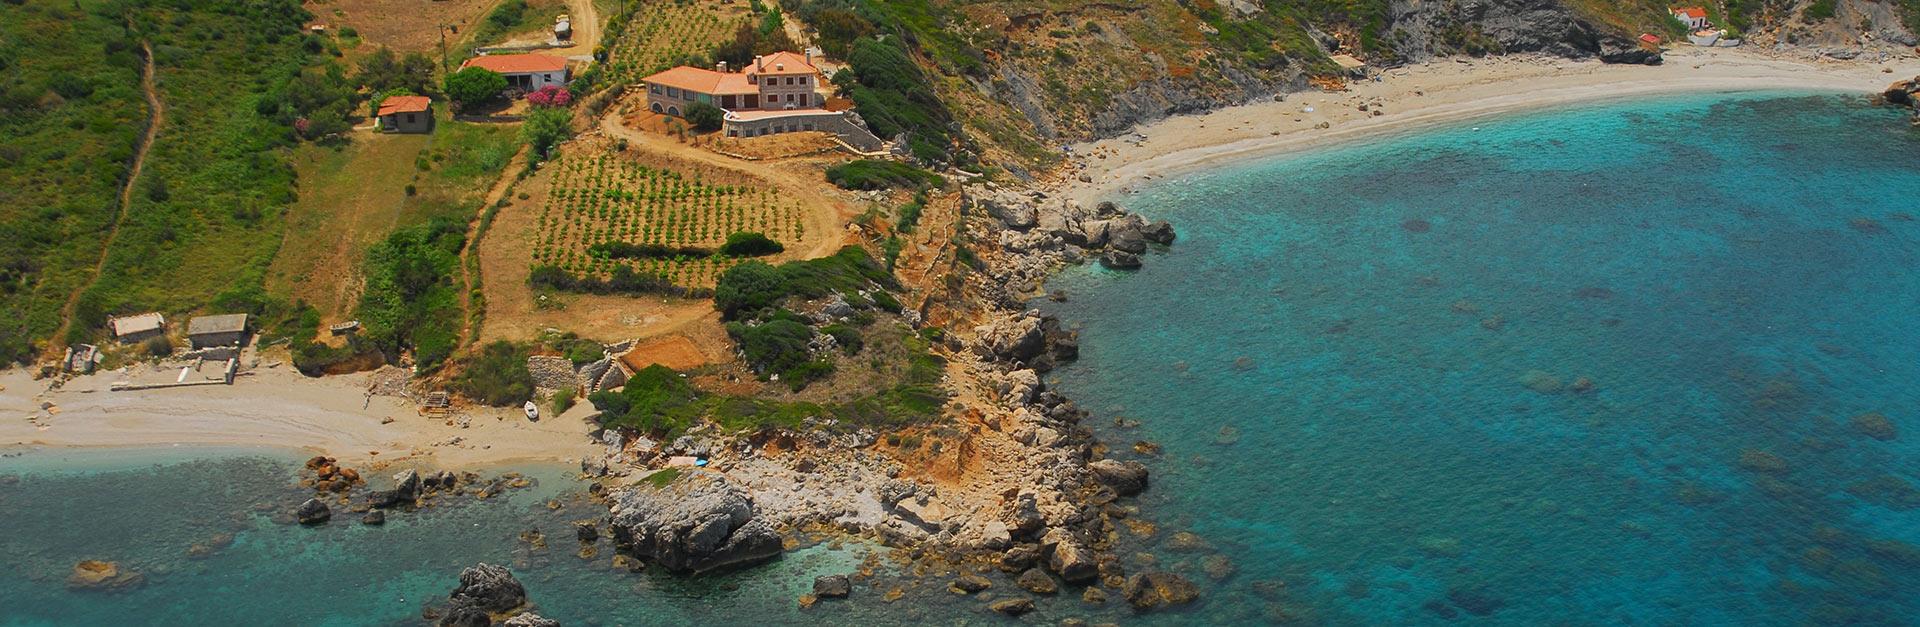 St George's House Potistika, Pelion Greece